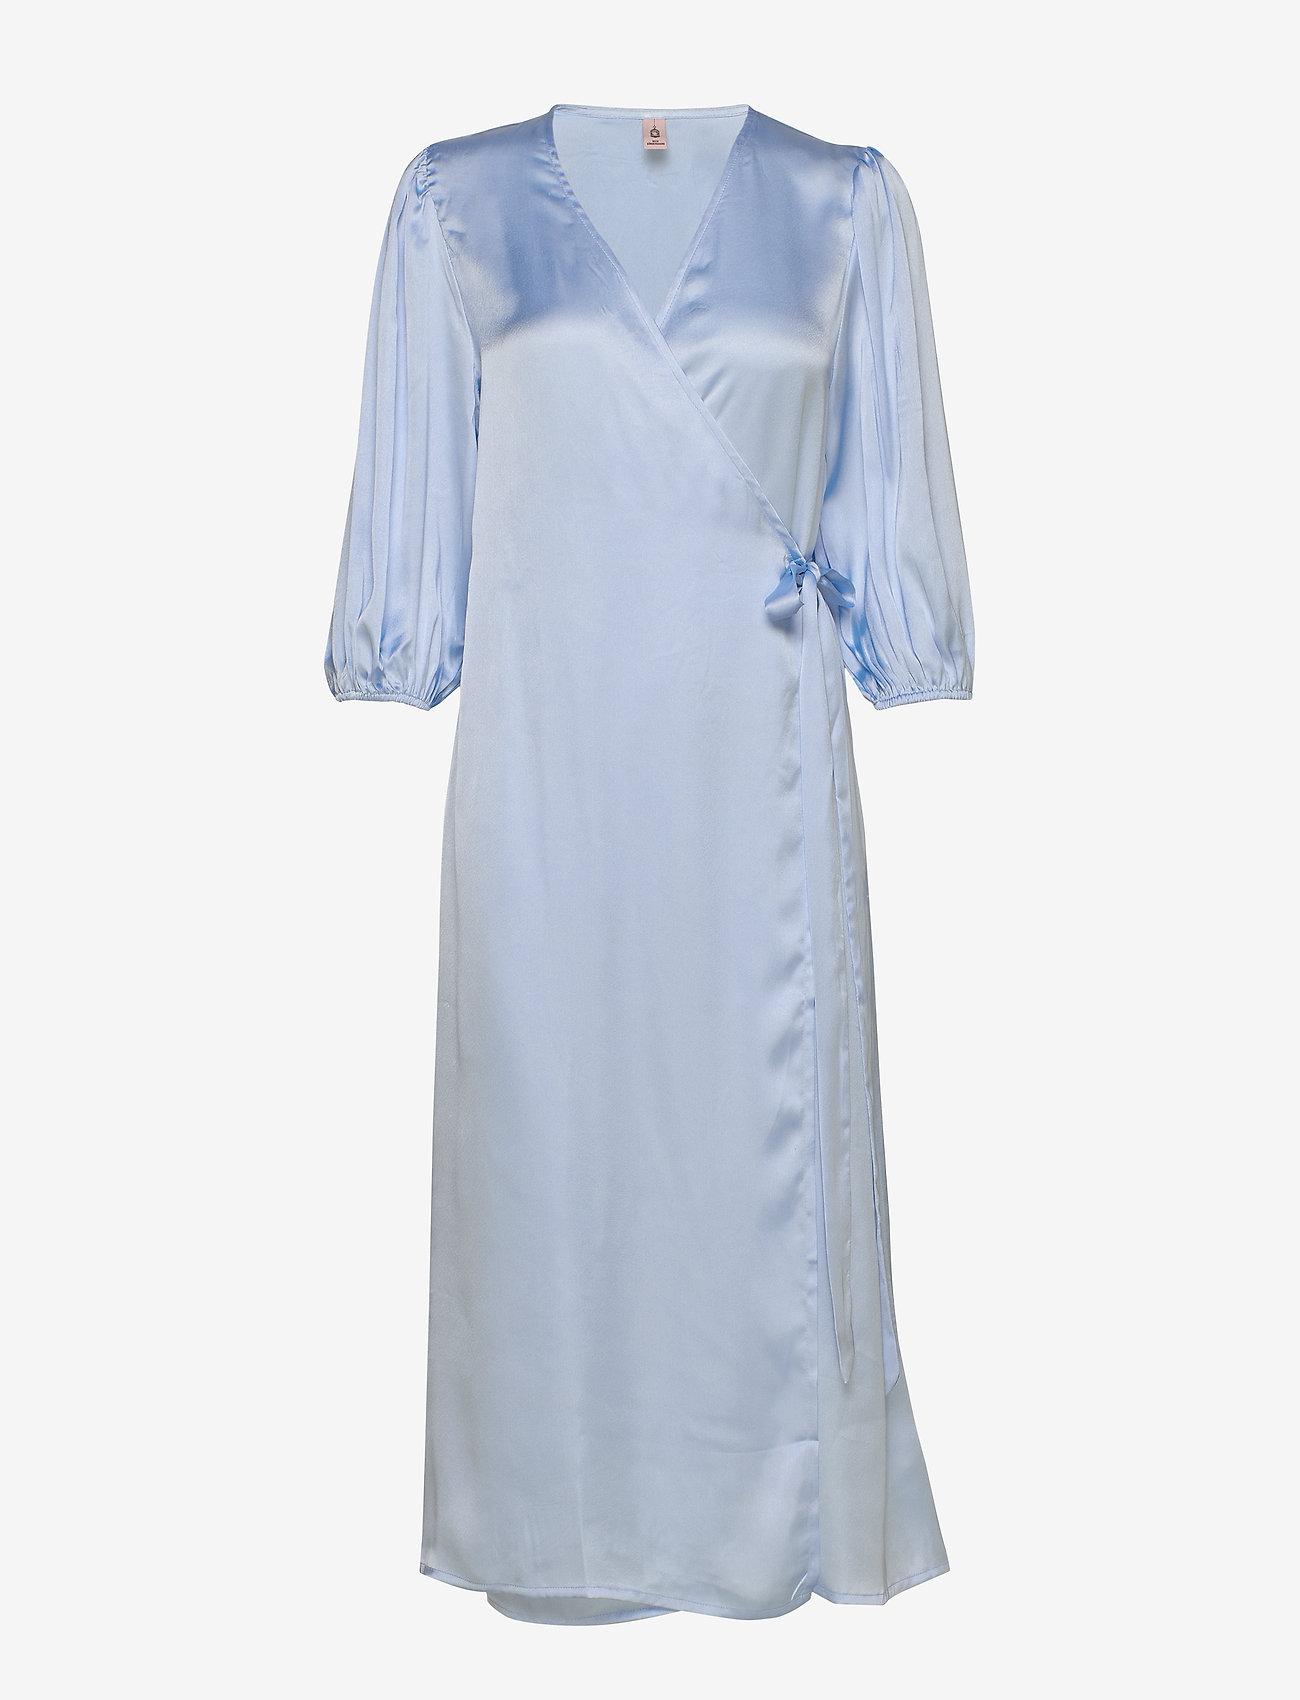 Becksöndergaard - Holiday dress - kietaisumekot - chambray blue - 0